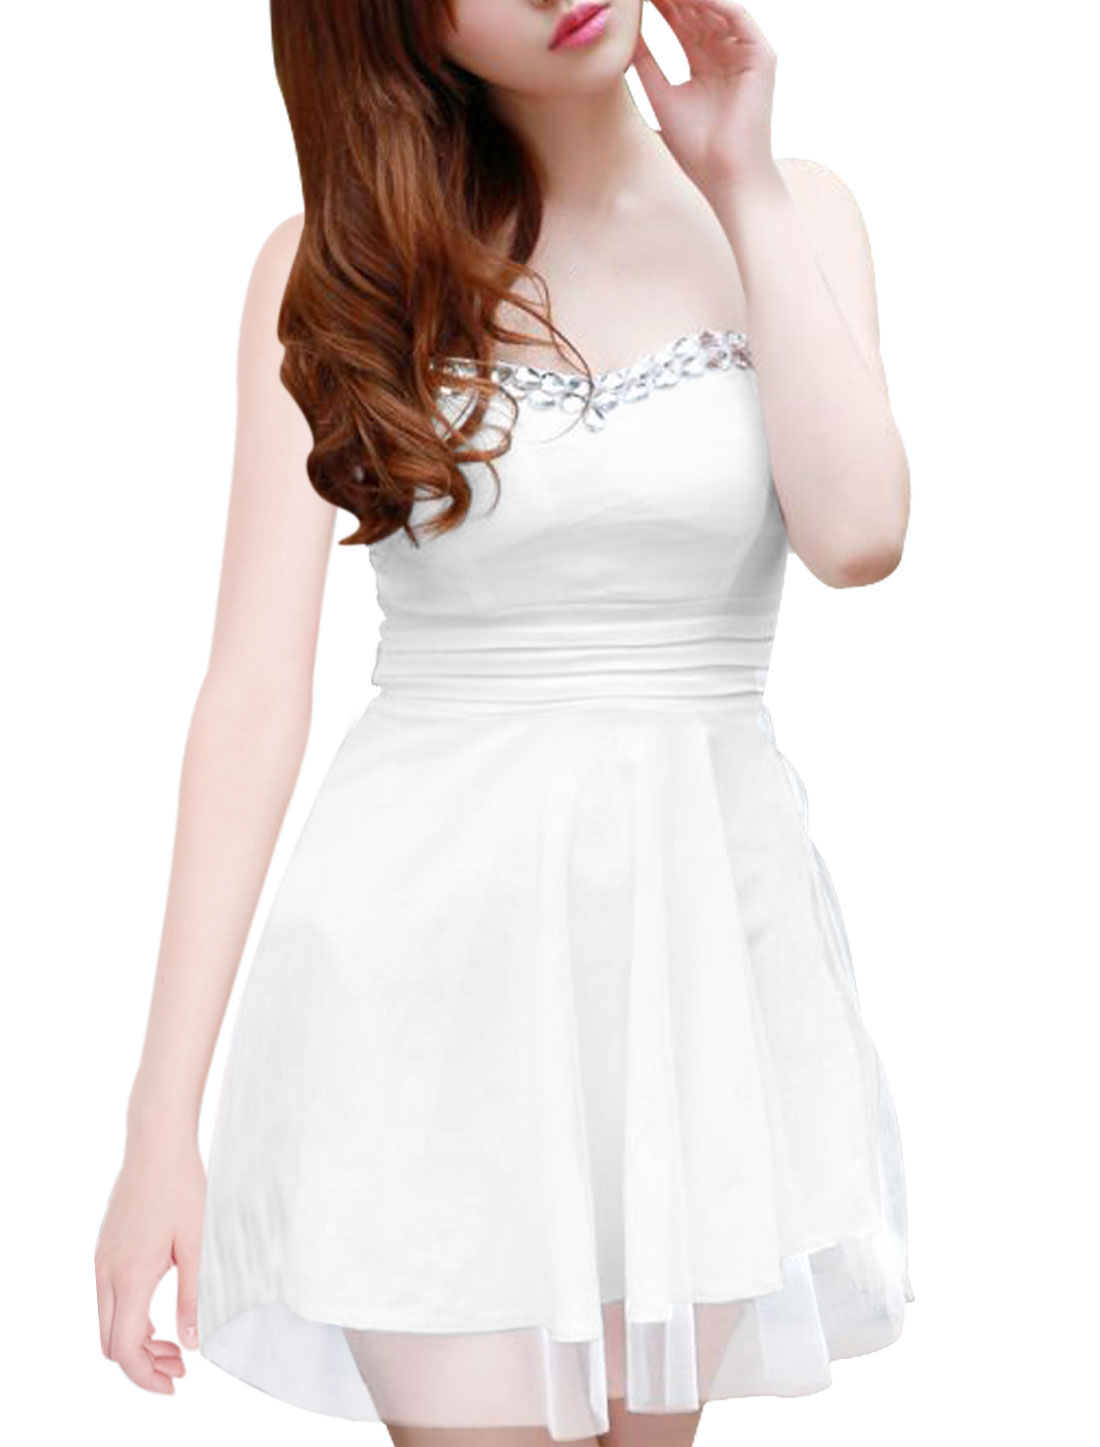 Allegra K Women Strapless Padded Shoulder Plastic Crystal Decor Mesh Overlay Tunic Top(China (Mainland))